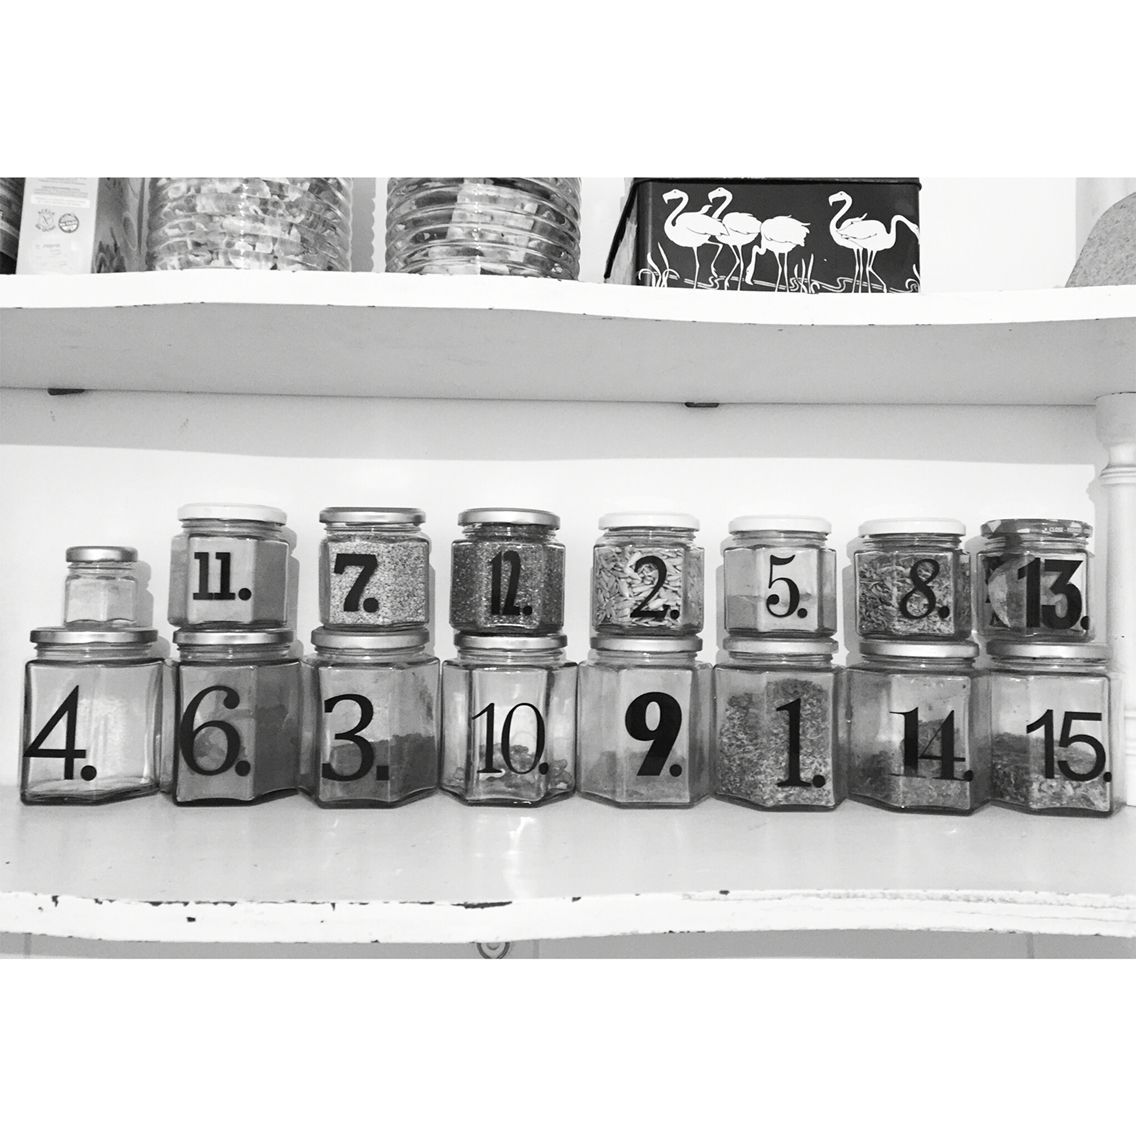 Numbers jam